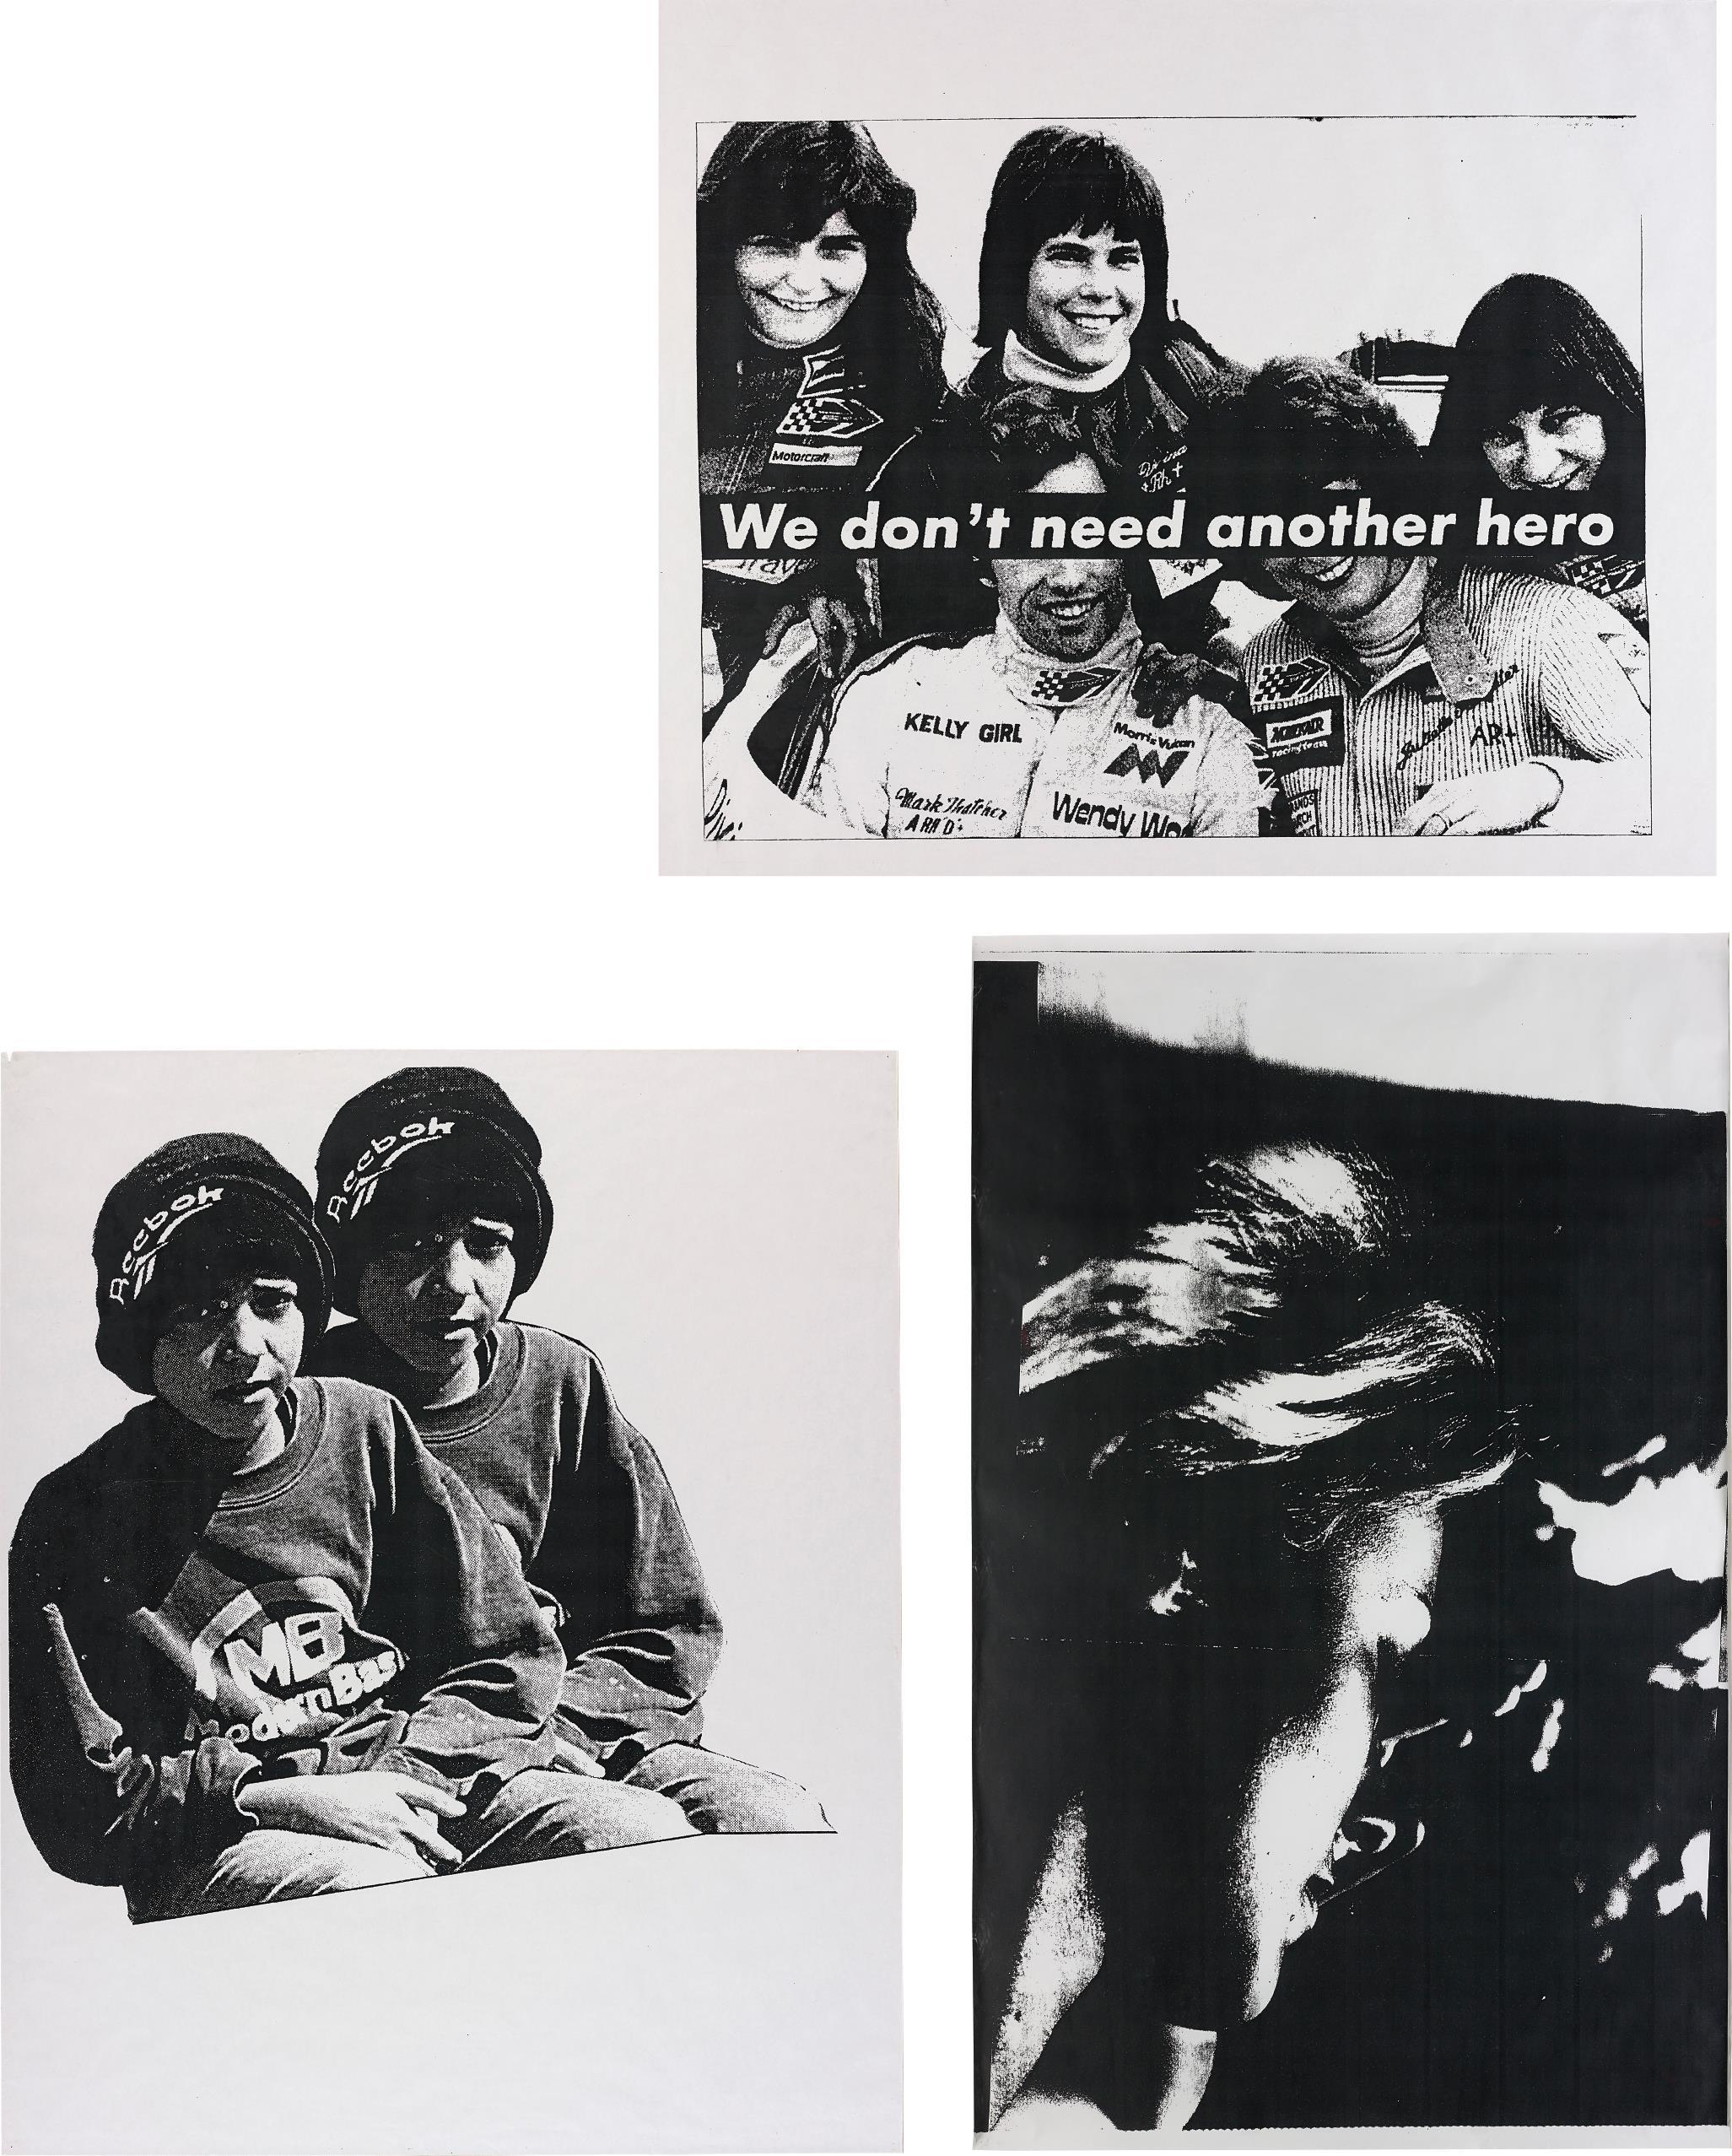 Nate Lowman-Three Works: (I) Sharon Stone; (II) We Don'T Need Another Hero; (III) Twin Boy Suicide Bomb-2004